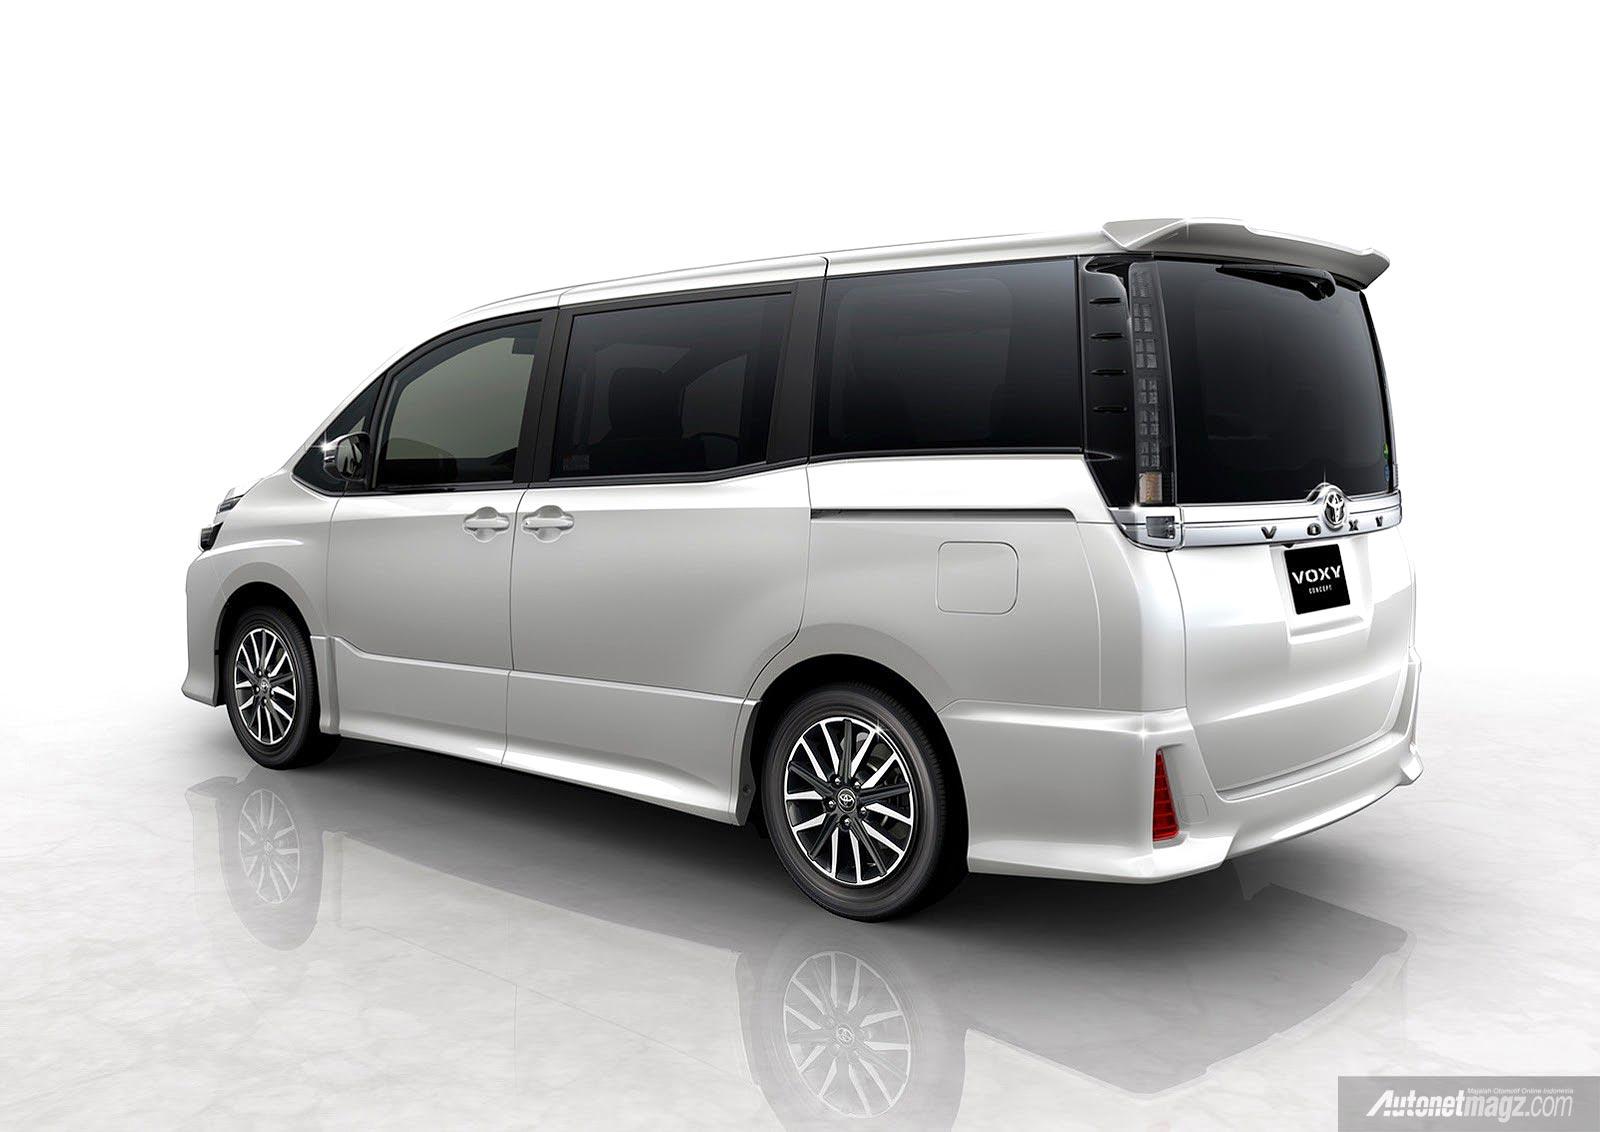 2014 Toyota Voxy  AutonetMagz  Review Mobil dan Motor